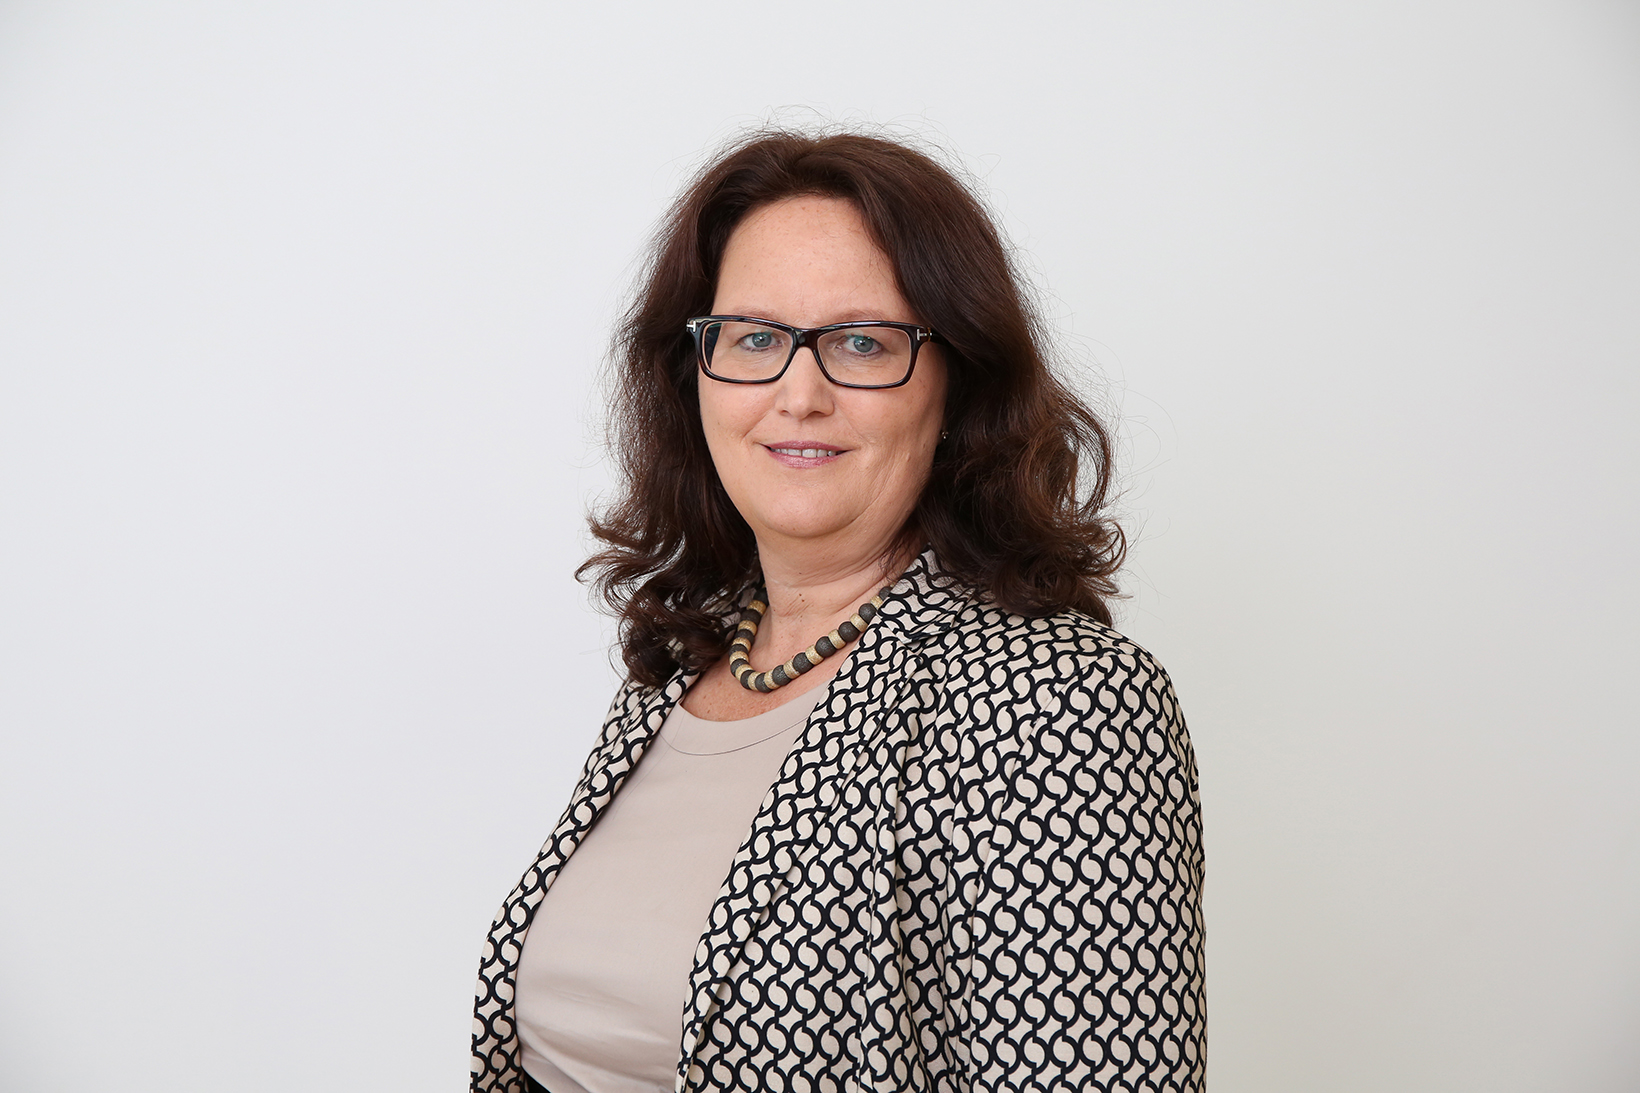 Edith Littich (c) Katharina Schiffl